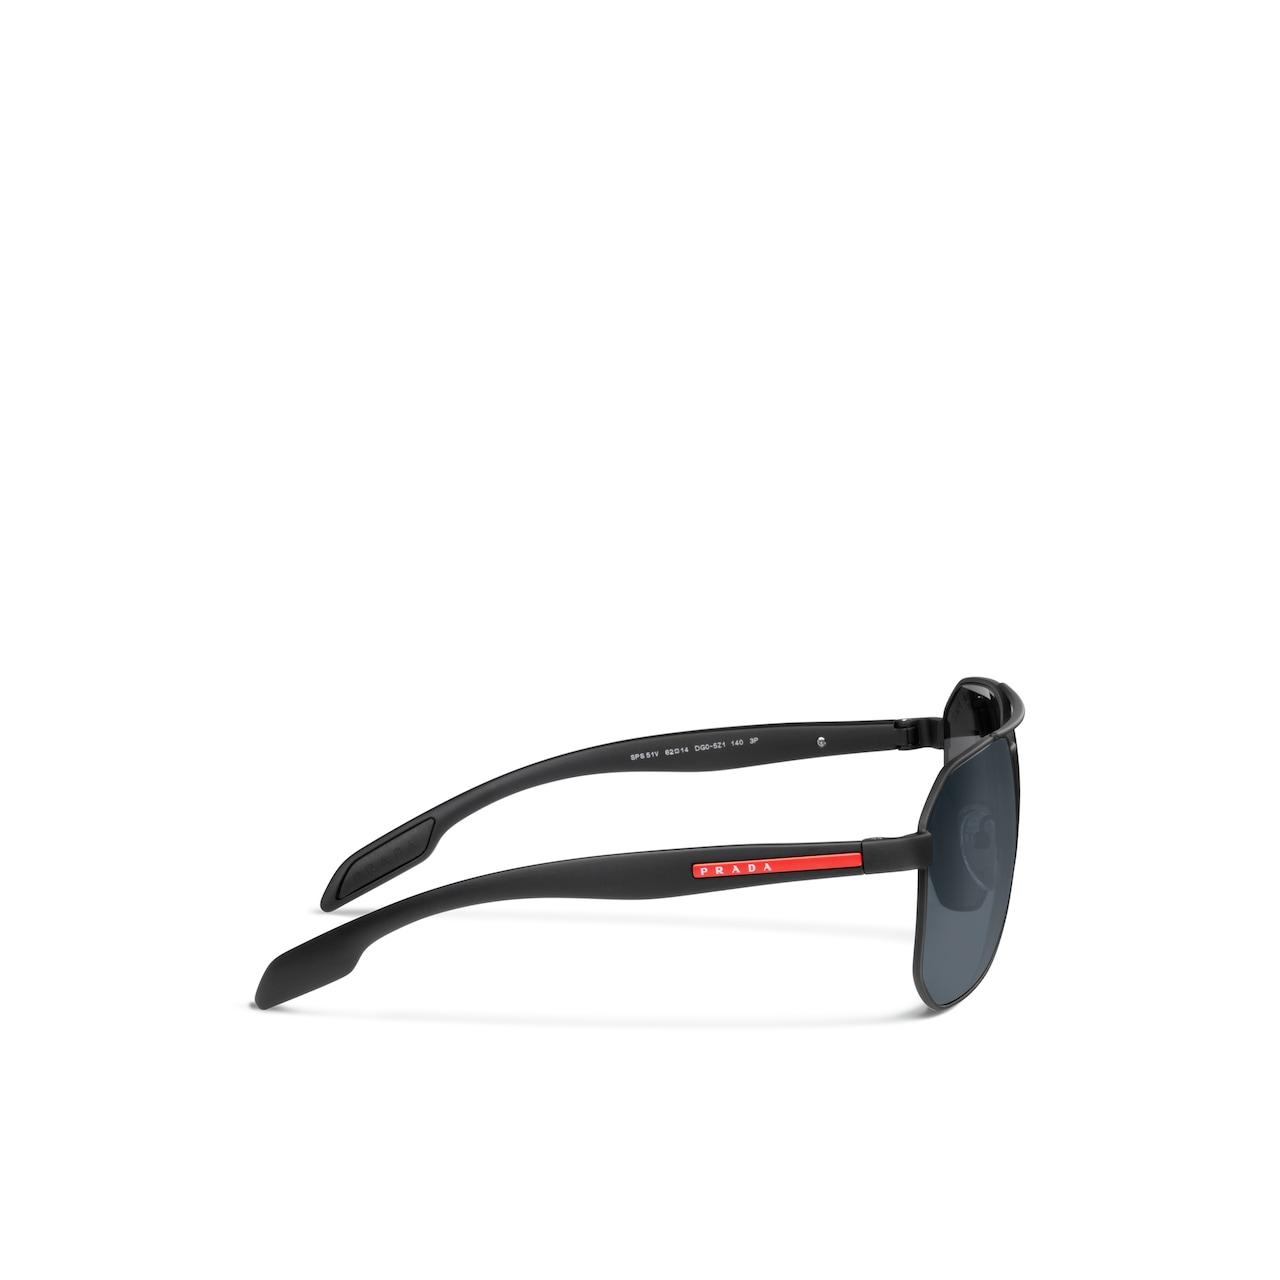 Prada Linea Rossa Eyewear Collection sunglasses 4